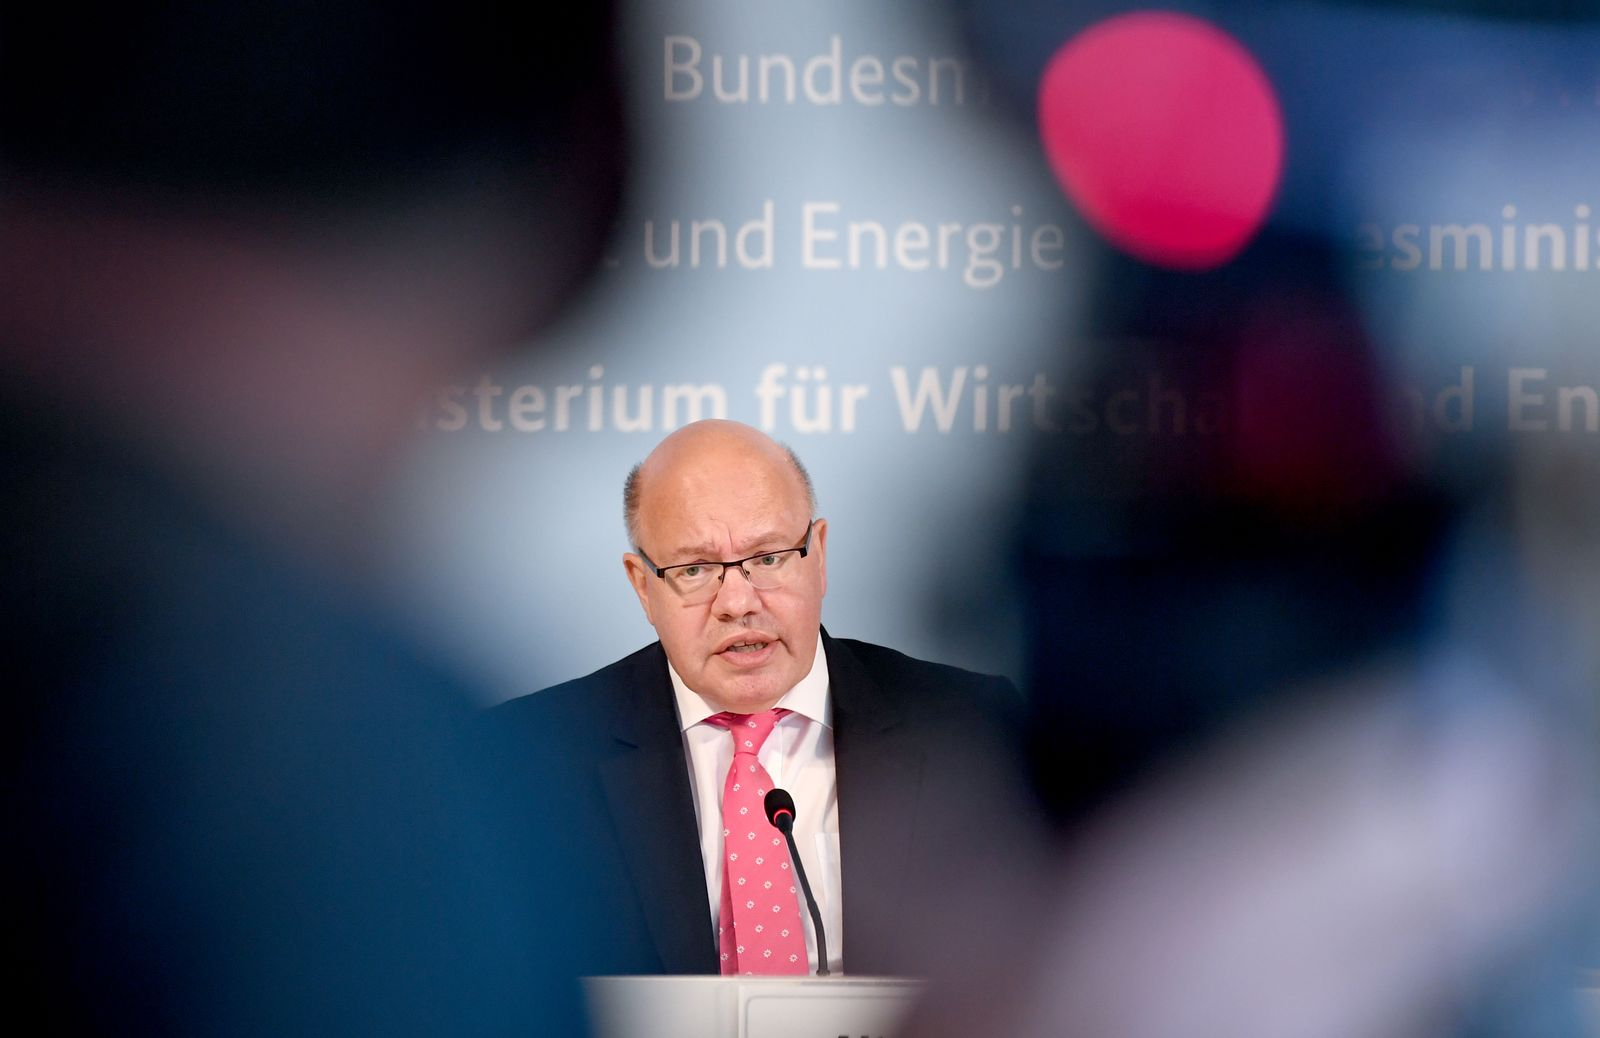 Wirtschaftsminister Peter Altmaier zu EU-Haushaltspaket